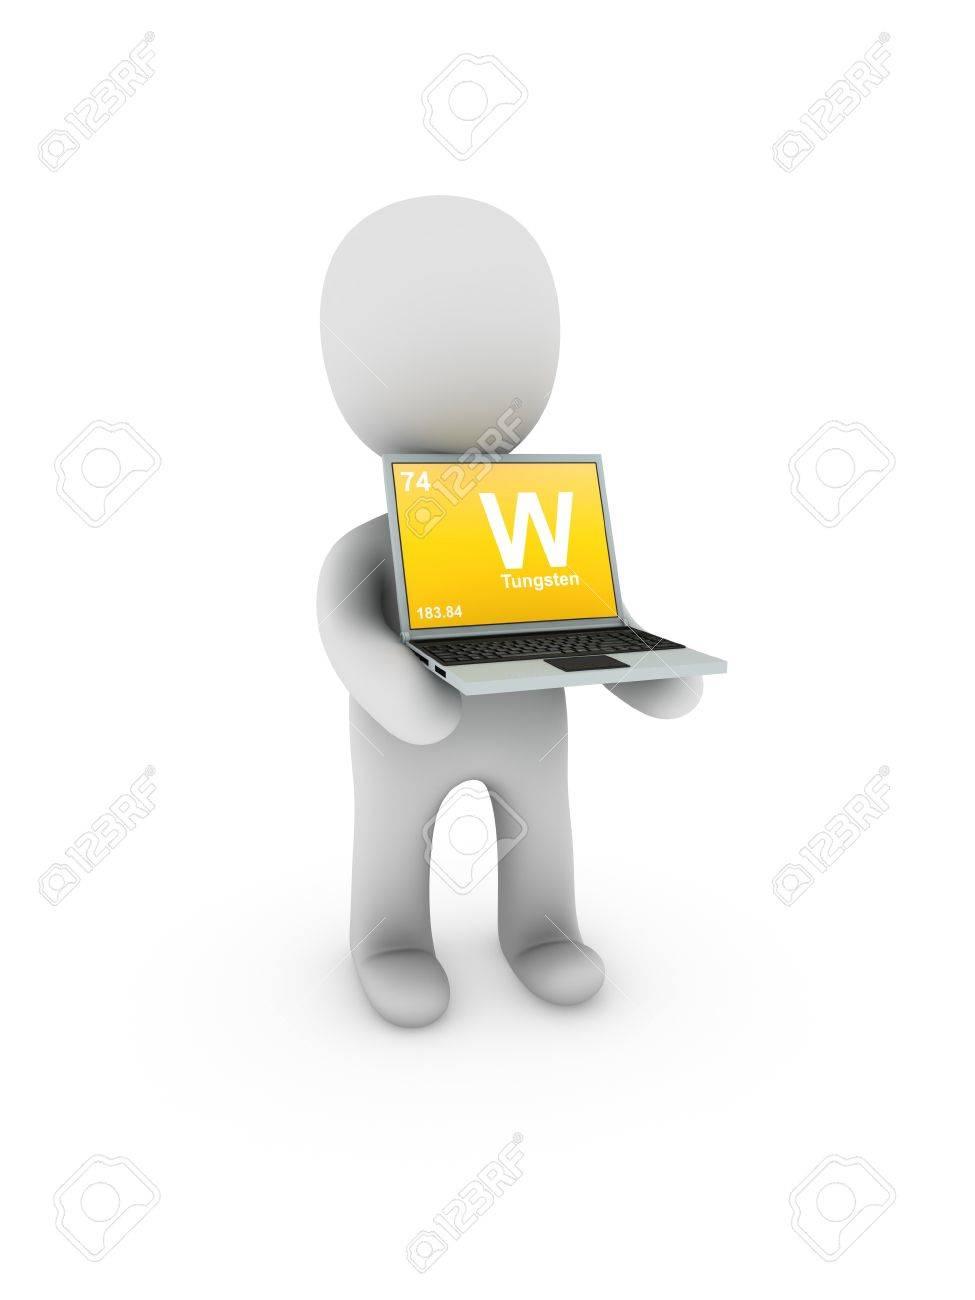 tungsten symbol on screen laptop Stock Photo - 13538918